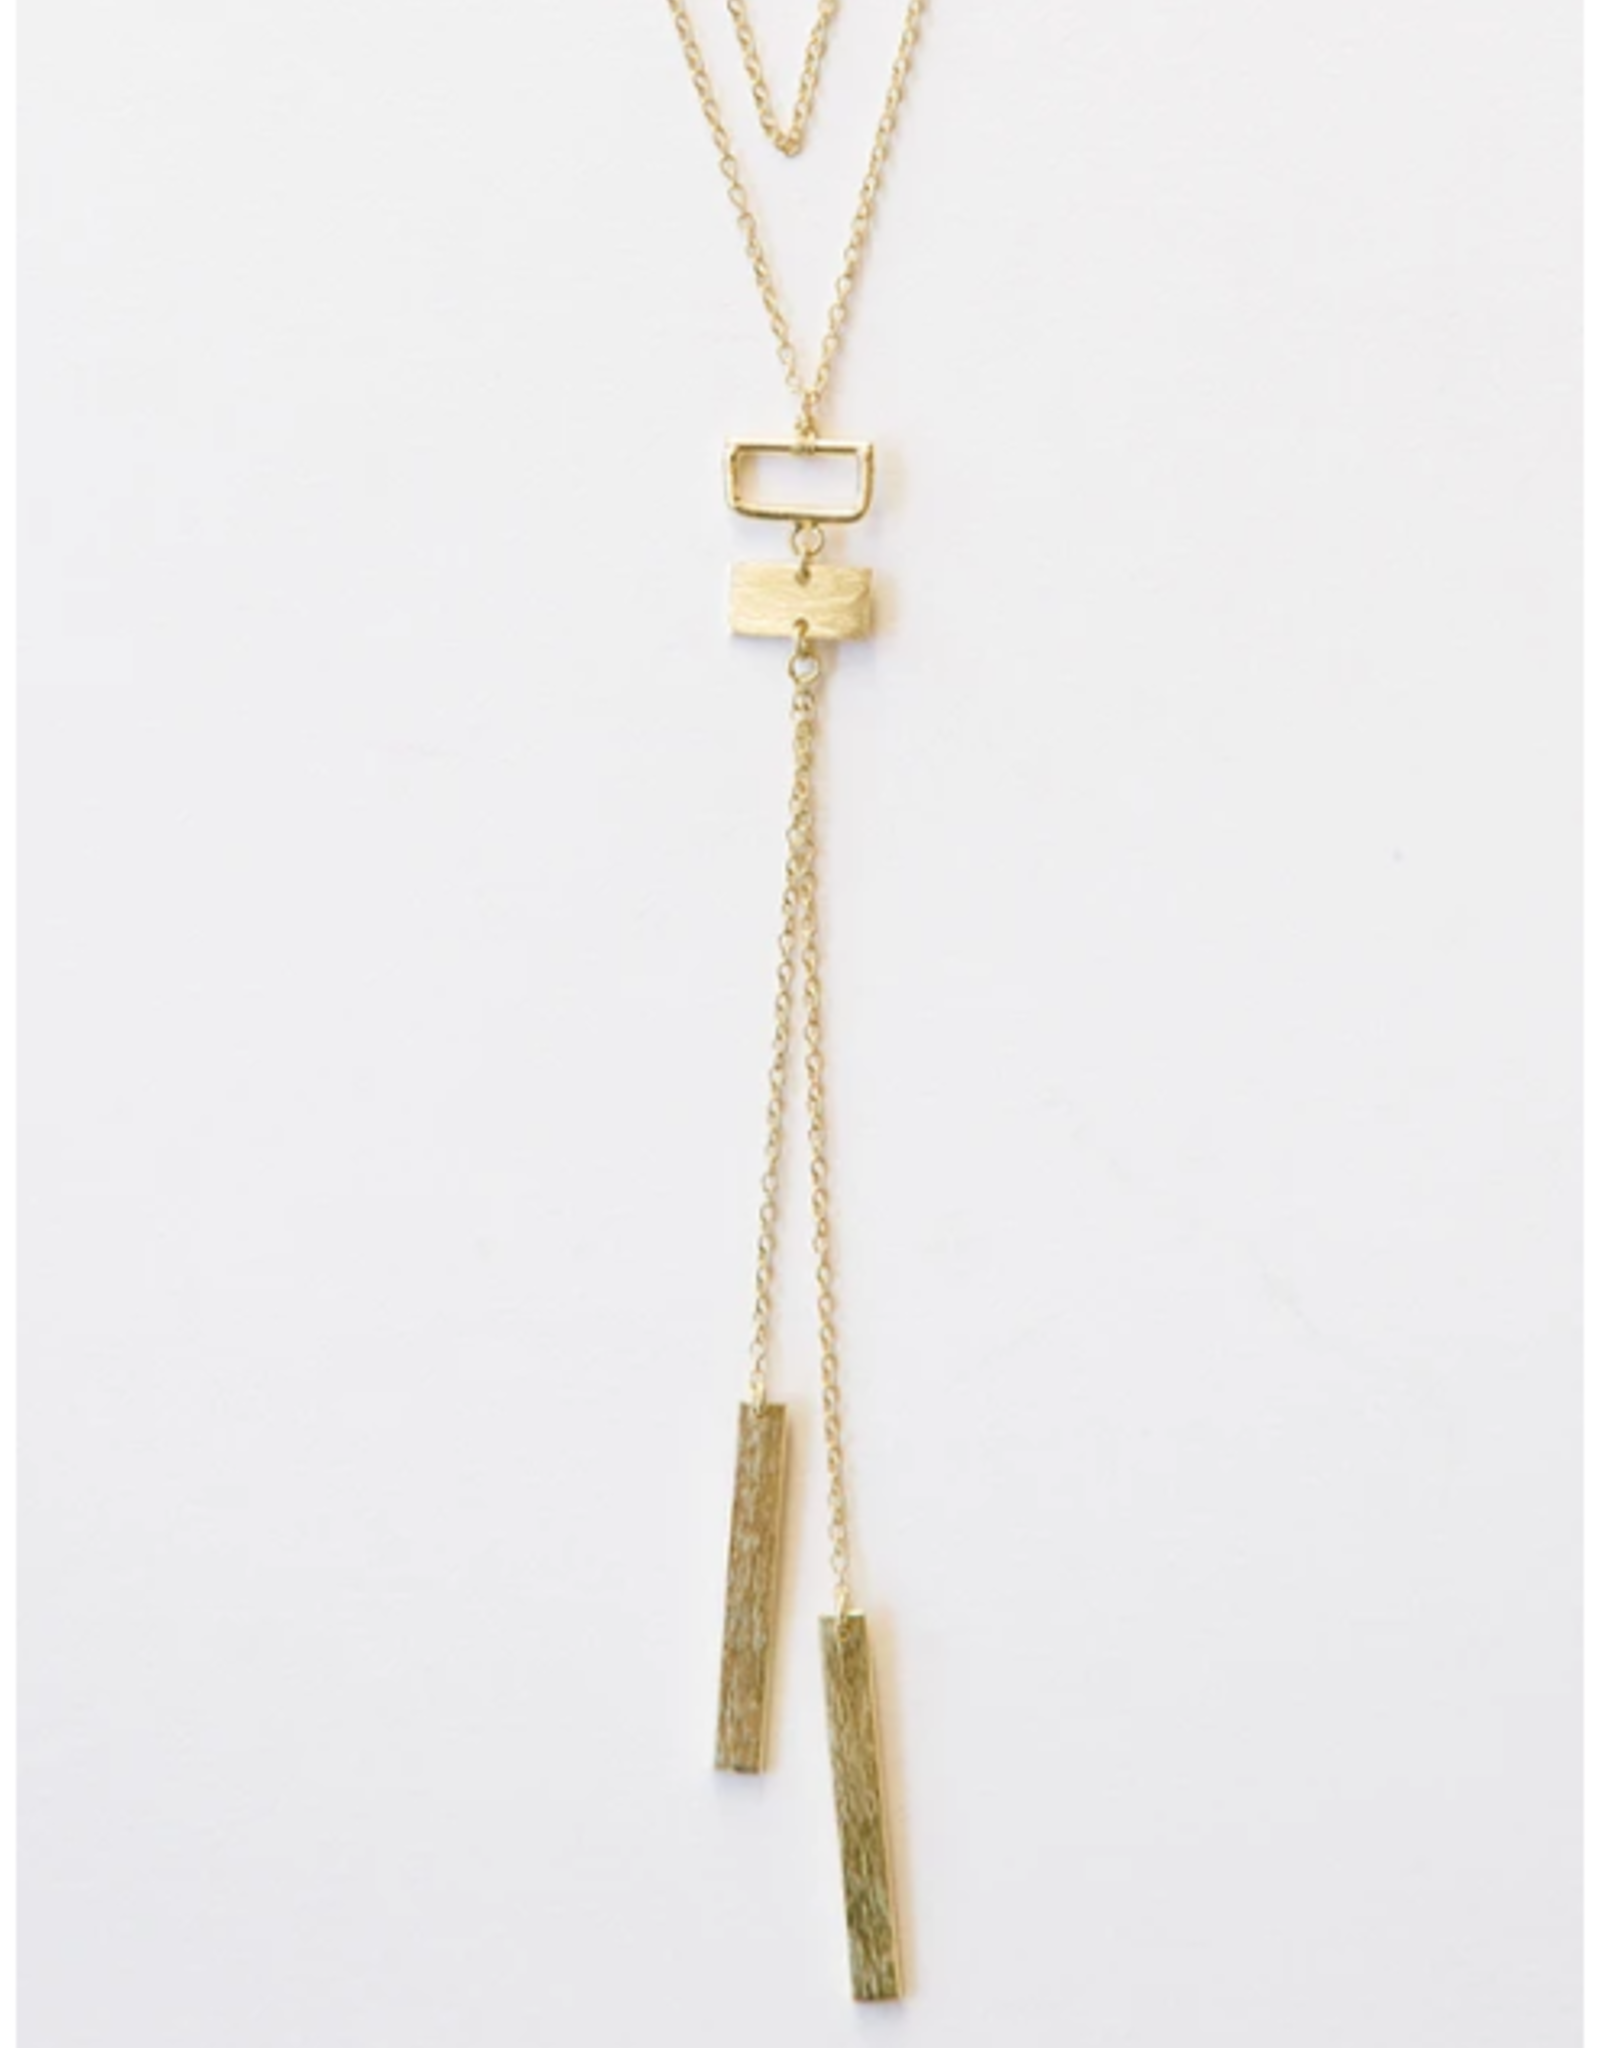 Bolo Necklace Gold